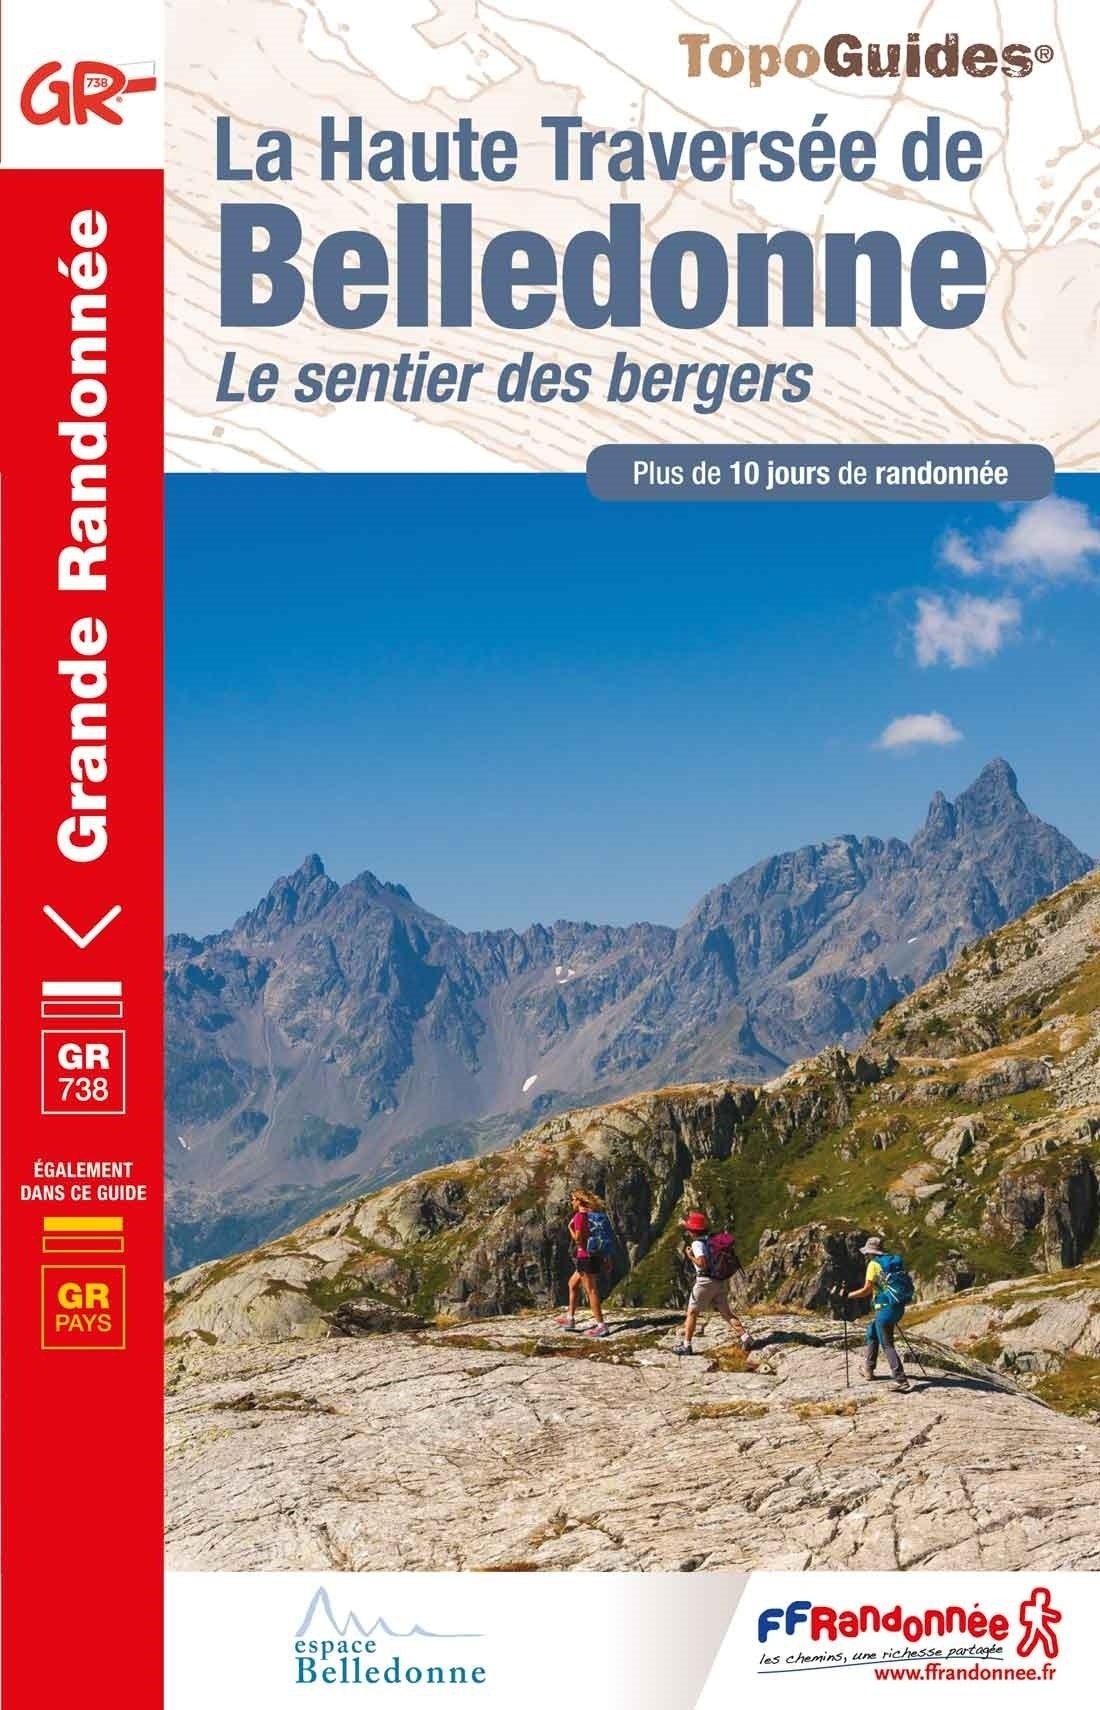 TG738 La Haute Traversée de Belledonne 9782751410505  FFRP Topoguides  Meerdaagse wandelroutes, Wandelgidsen Chartreuse, Bauges, Vanoise